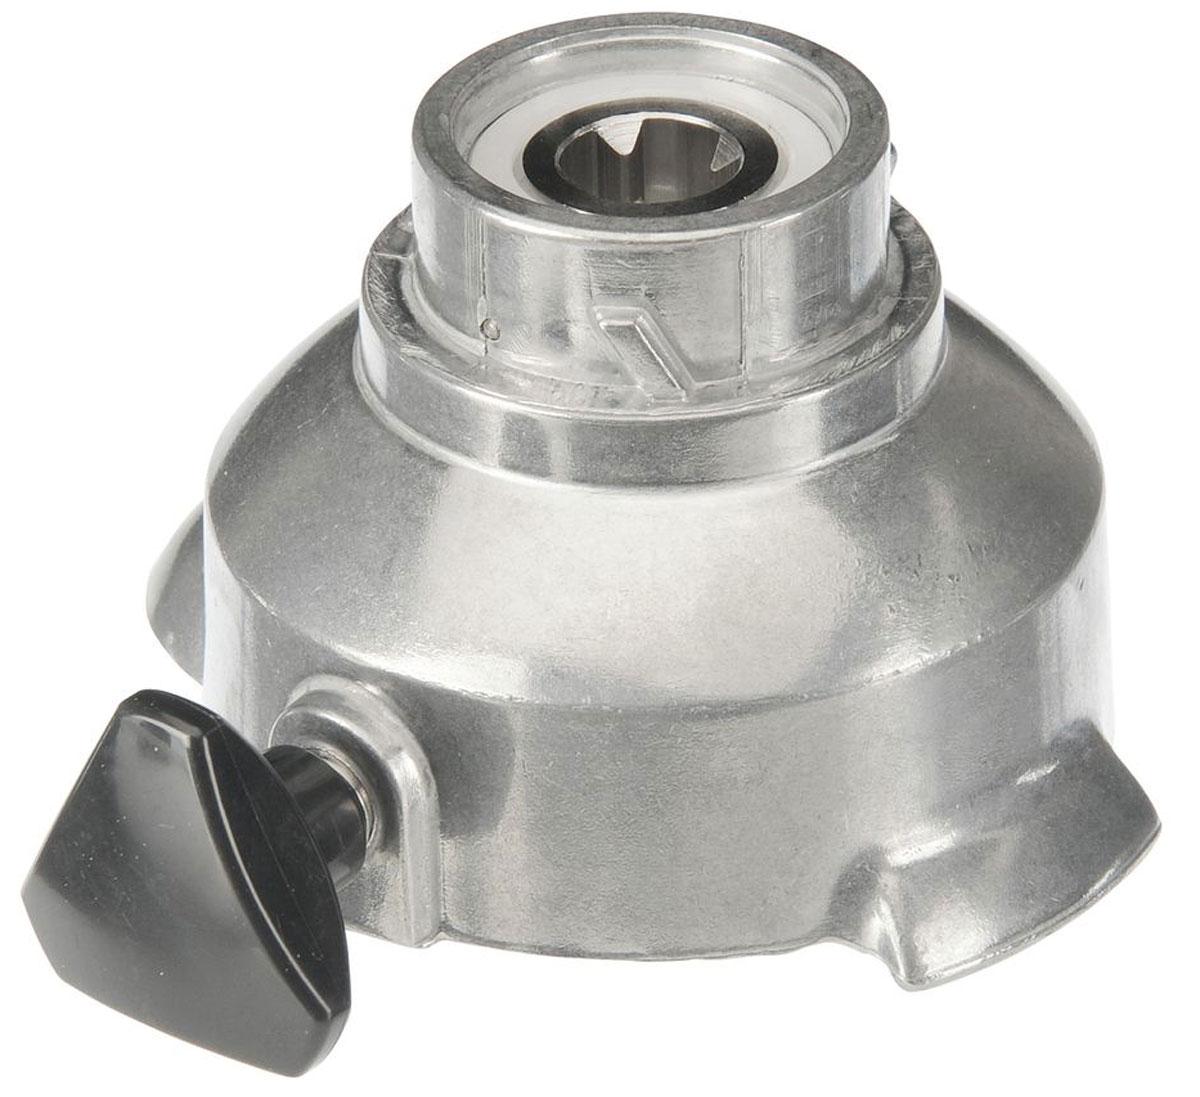 цена на Bosch MUZ8AD1 адаптер для насадок для кухонных комбайнов